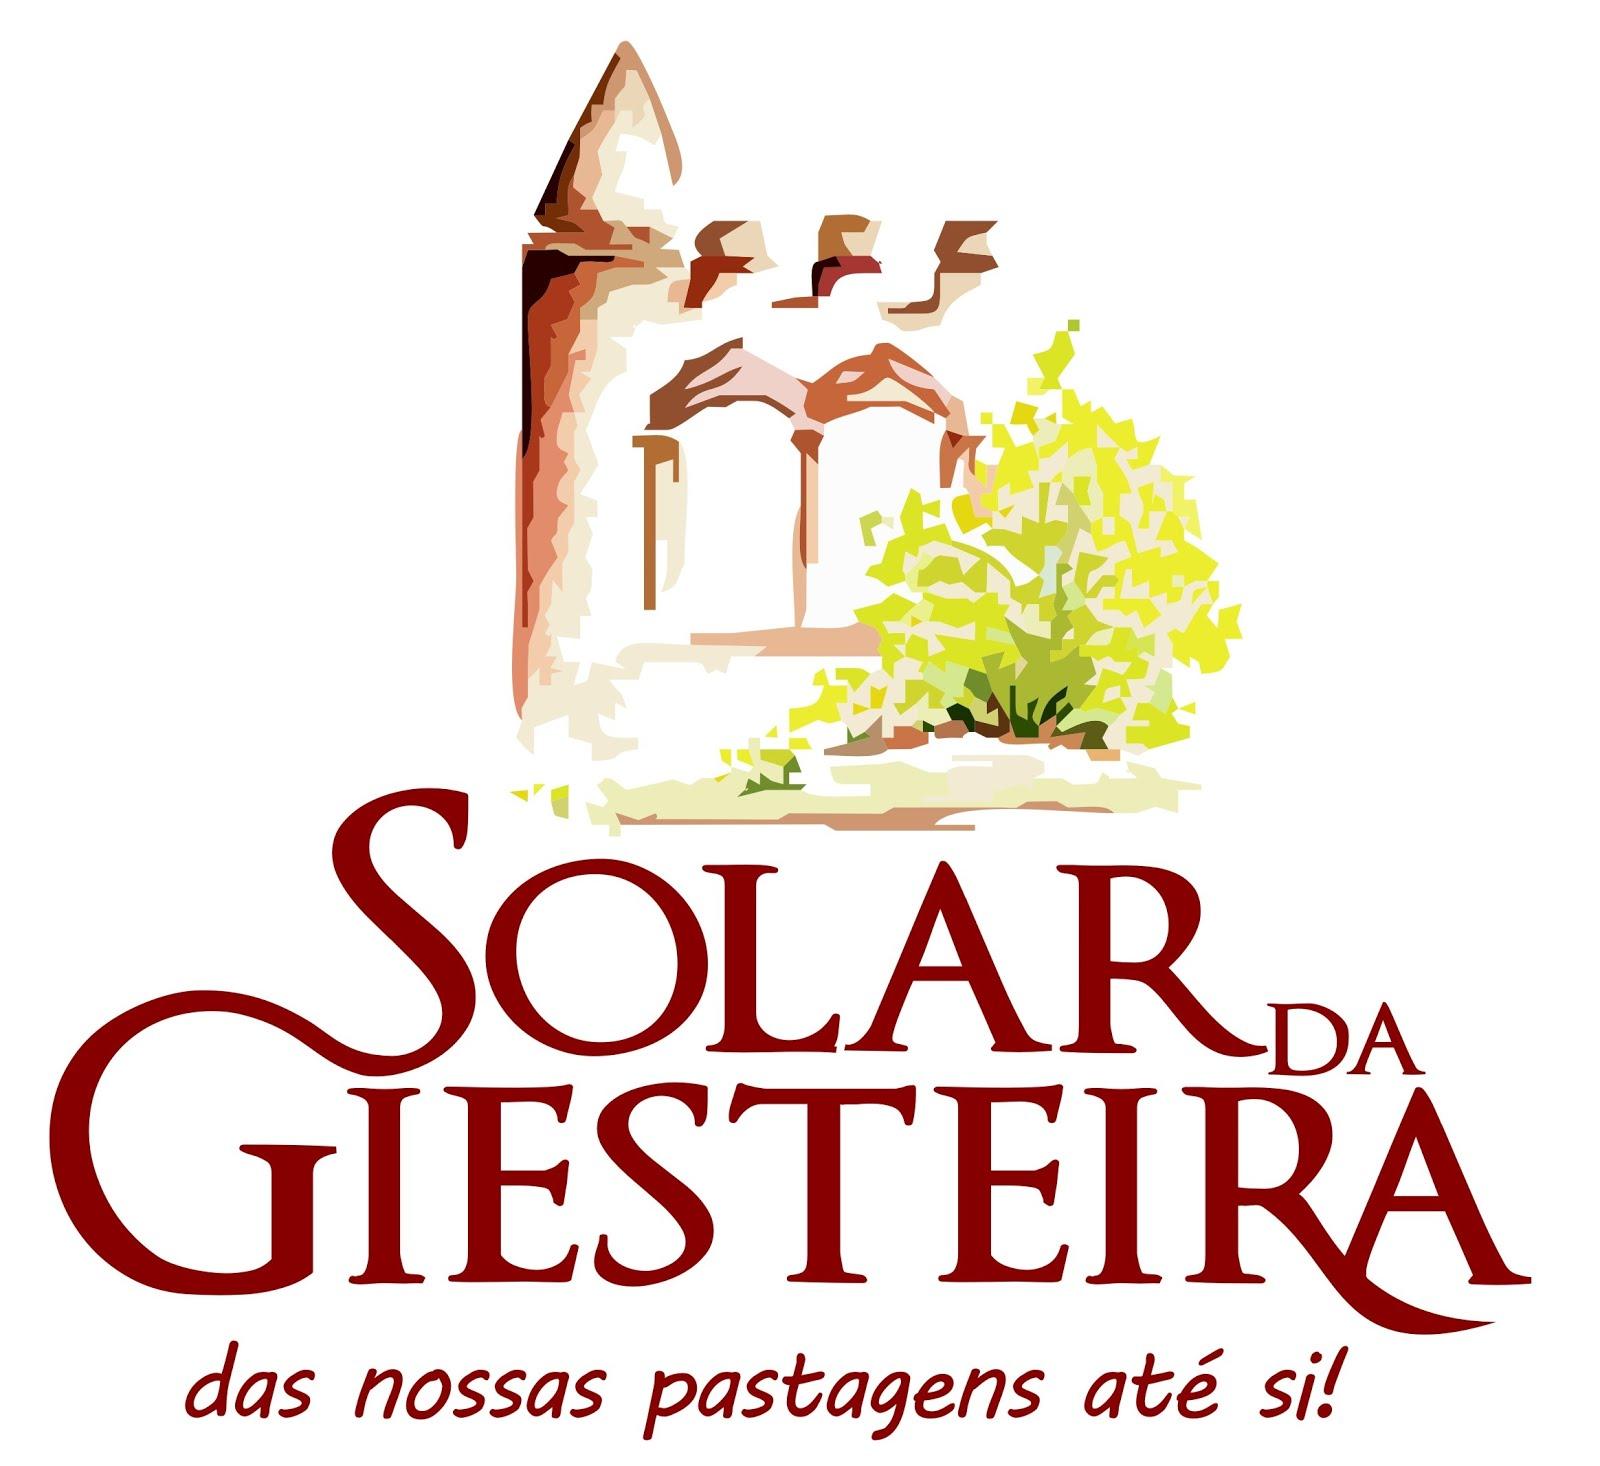 Solar Da Giesteira